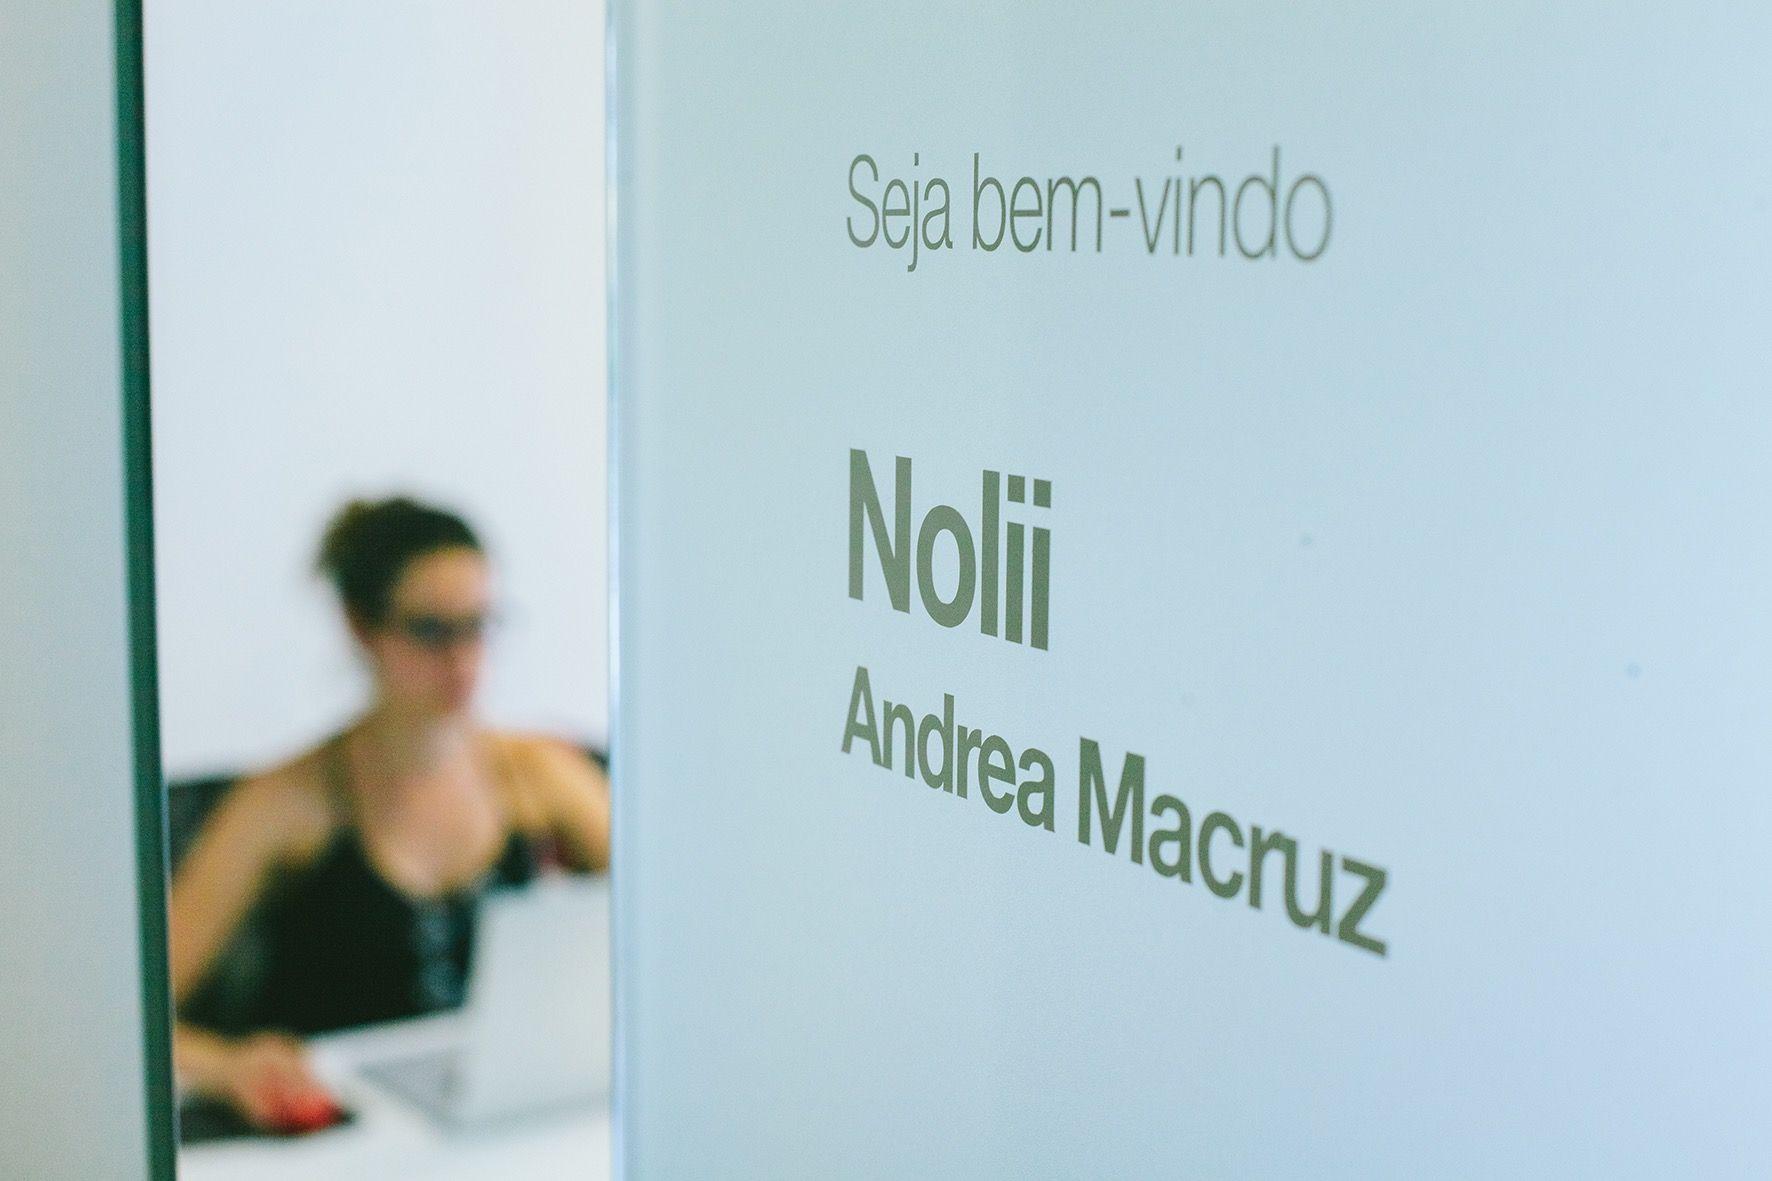 NOLII | ANDREA MACRUZ #designbrasileiro #feitonobrasil #designbrasil #mobiliariobrasileiro #decoração #arquitetura #casa #braziliandesign #furniture #homedecor #contemporarydesign #designcontemporâneo #Nolii #andreamacruz